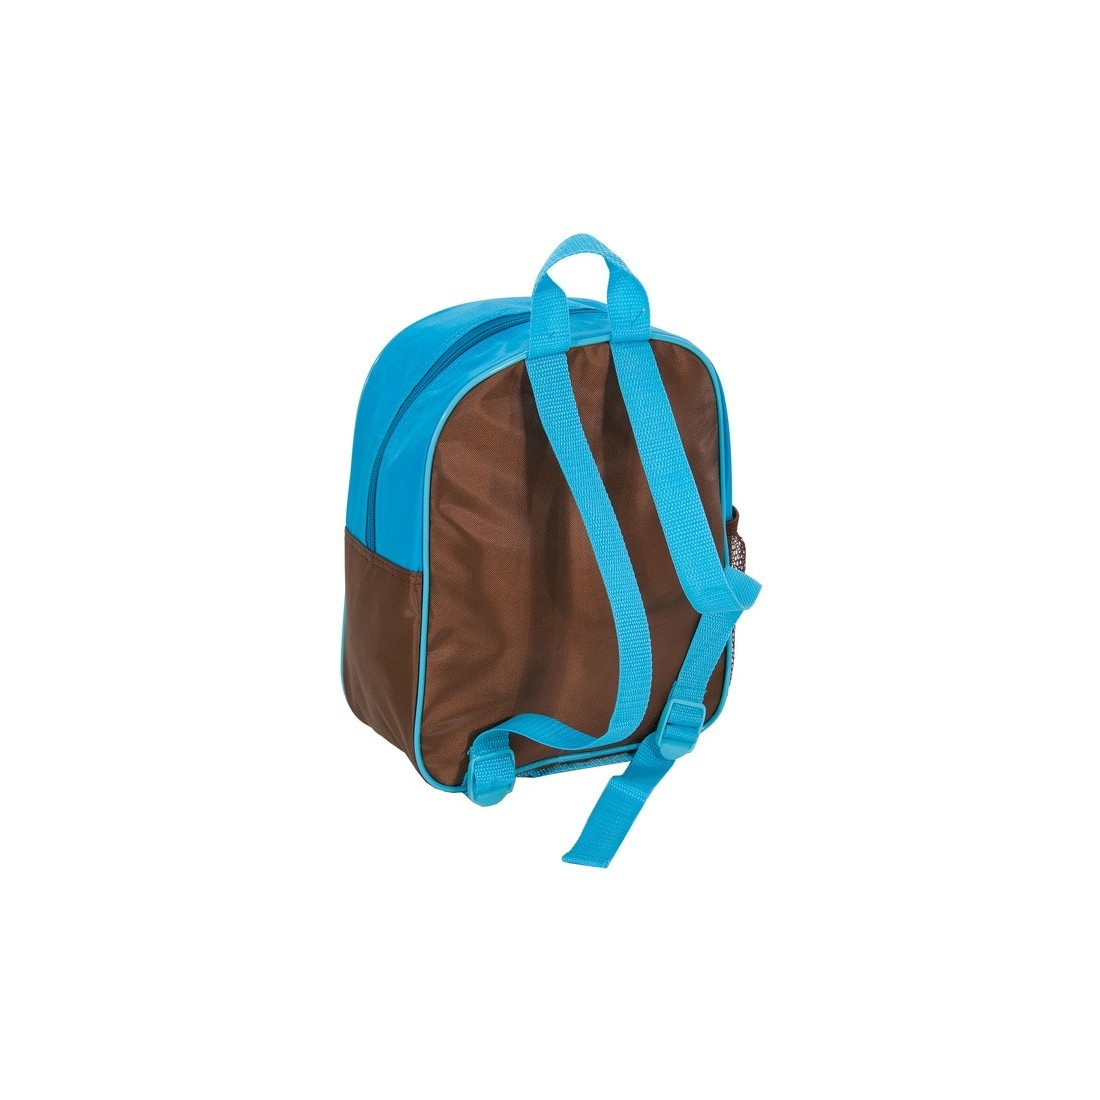 Plecaczek Rachael Hale niebieski z labradorem - plecak-tornister.pl